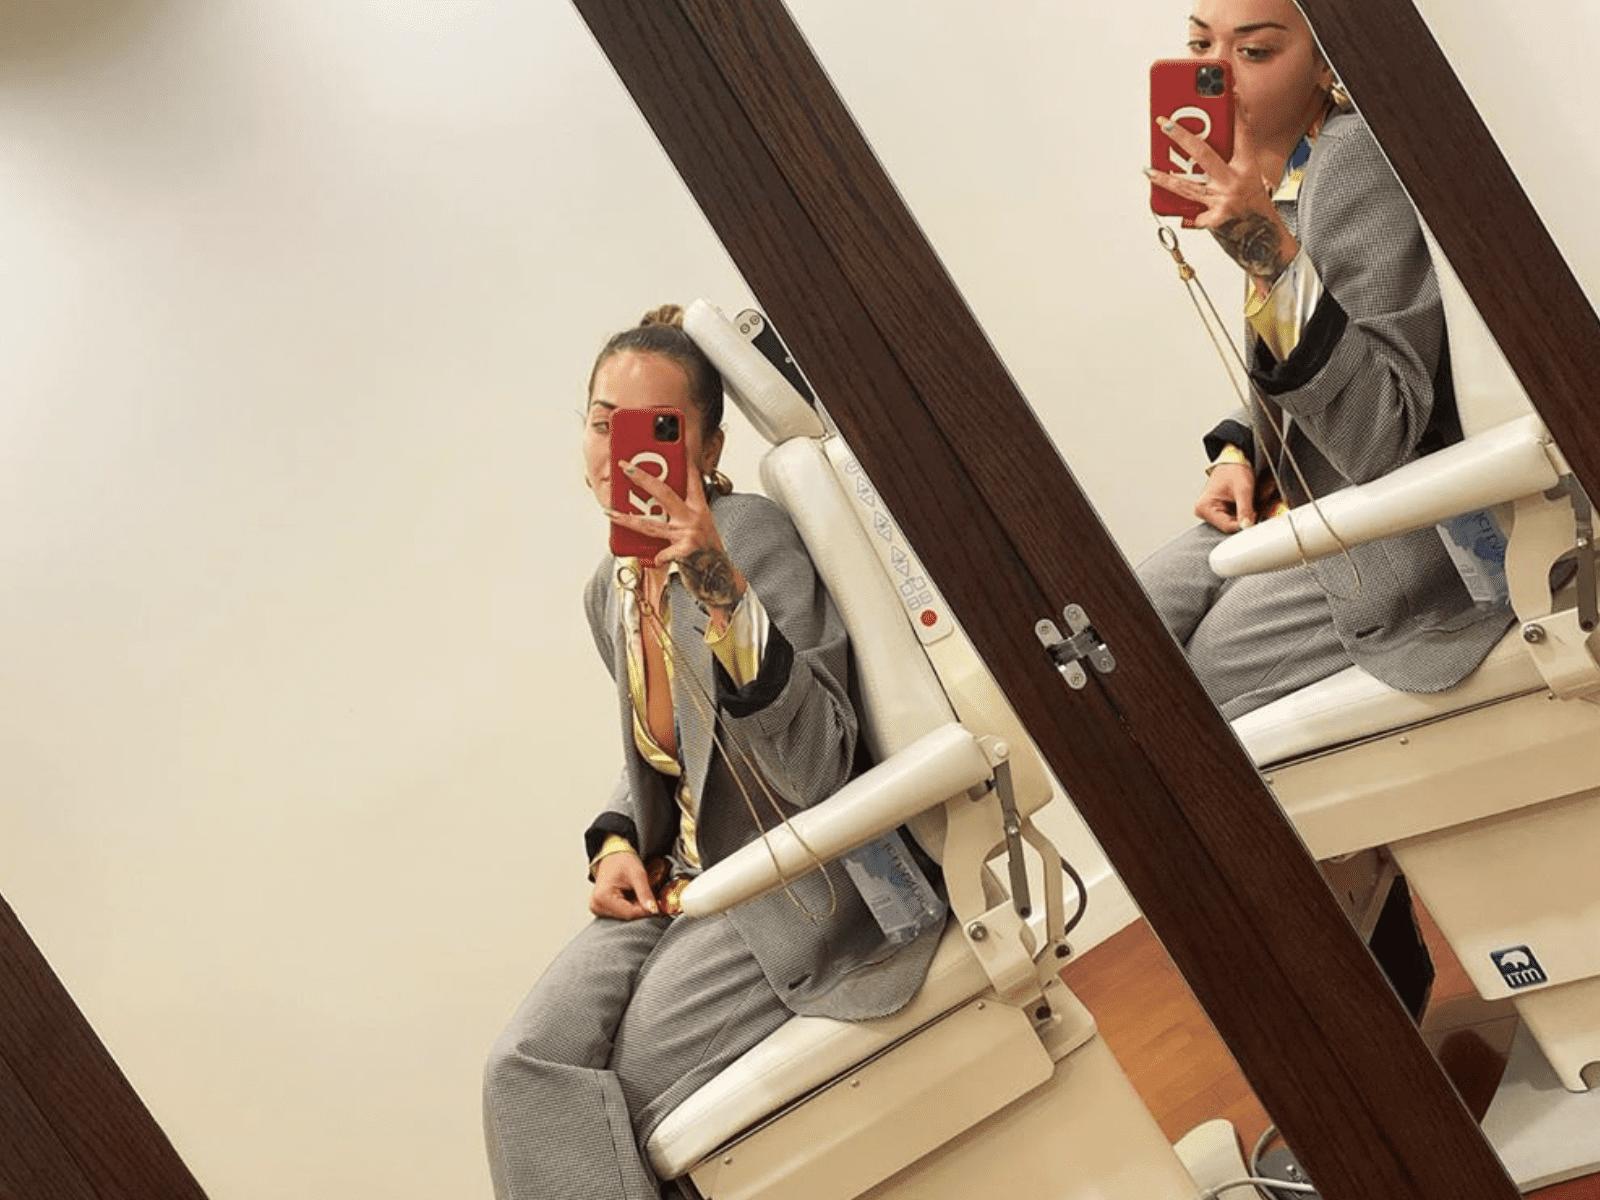 Rita Ora Mirror Selife Pic